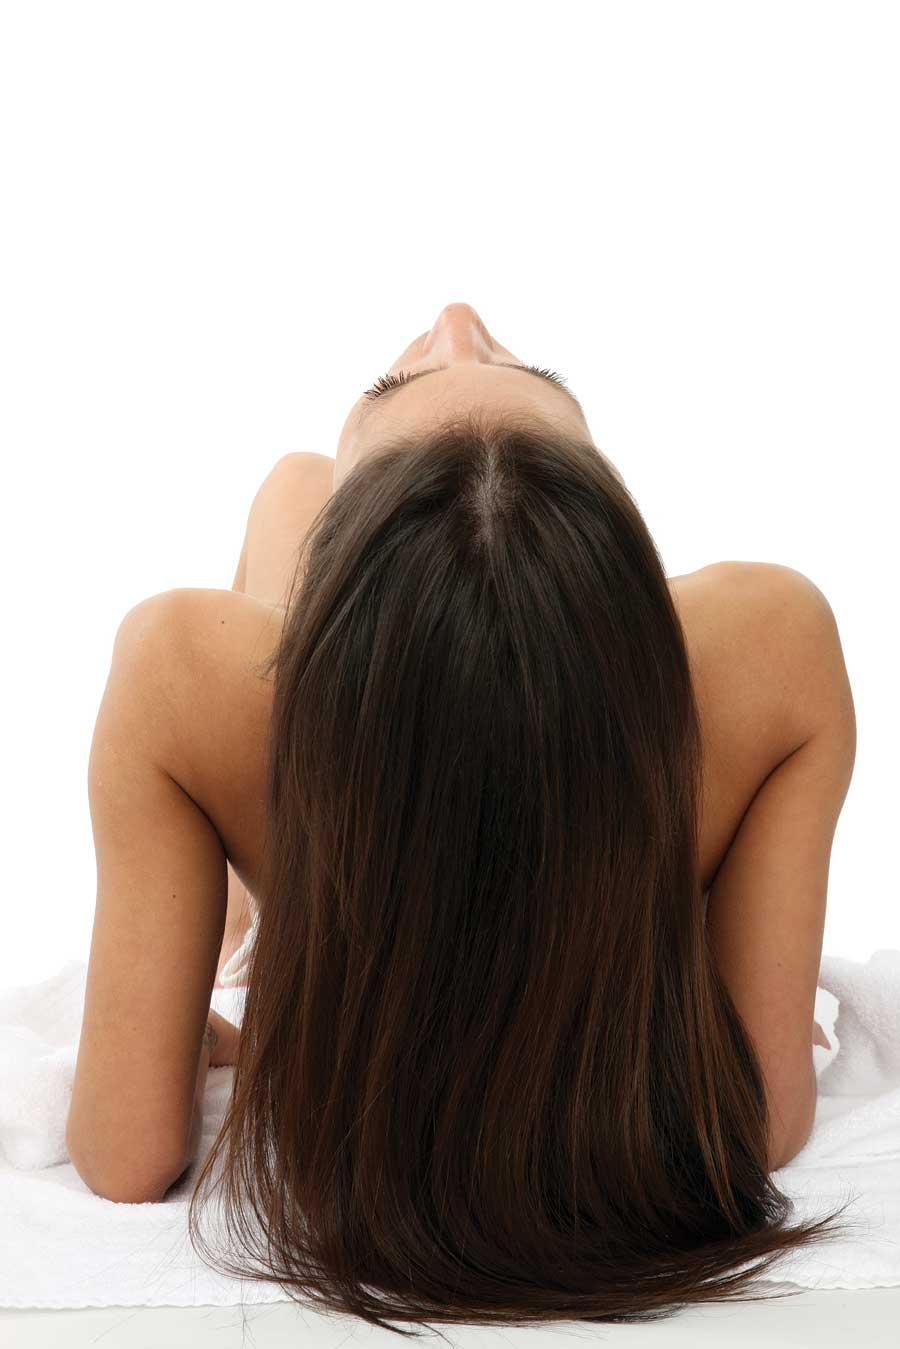 Фото девушек со спины без брюнетки